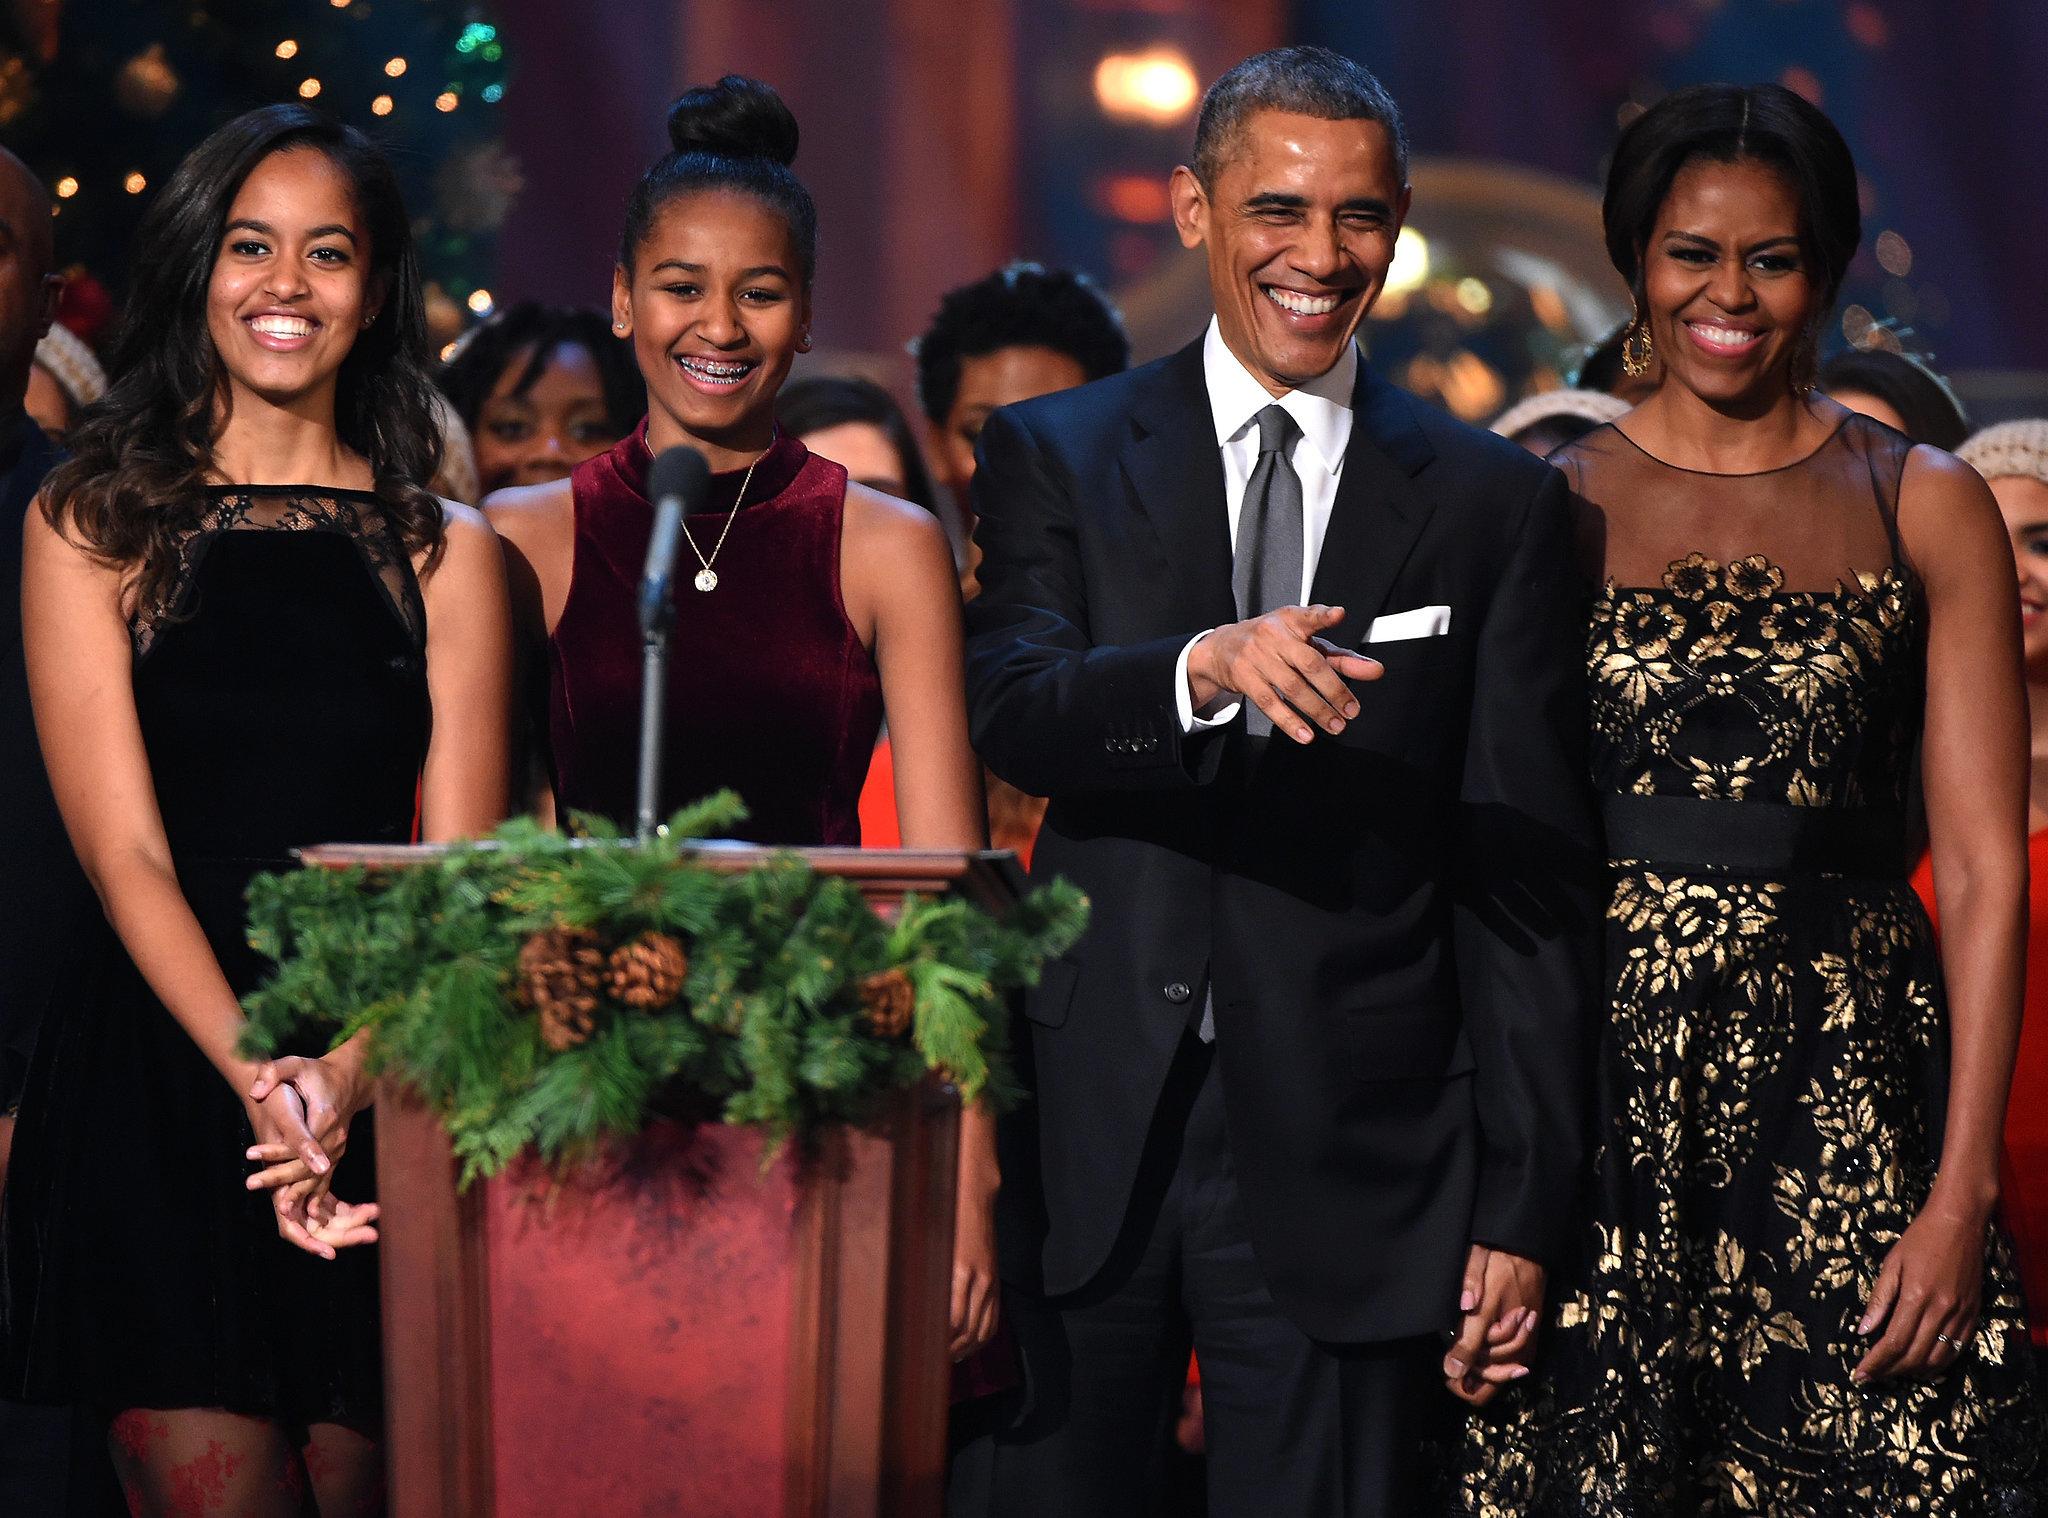 December-Obama-family-hit-stage-together-TNT